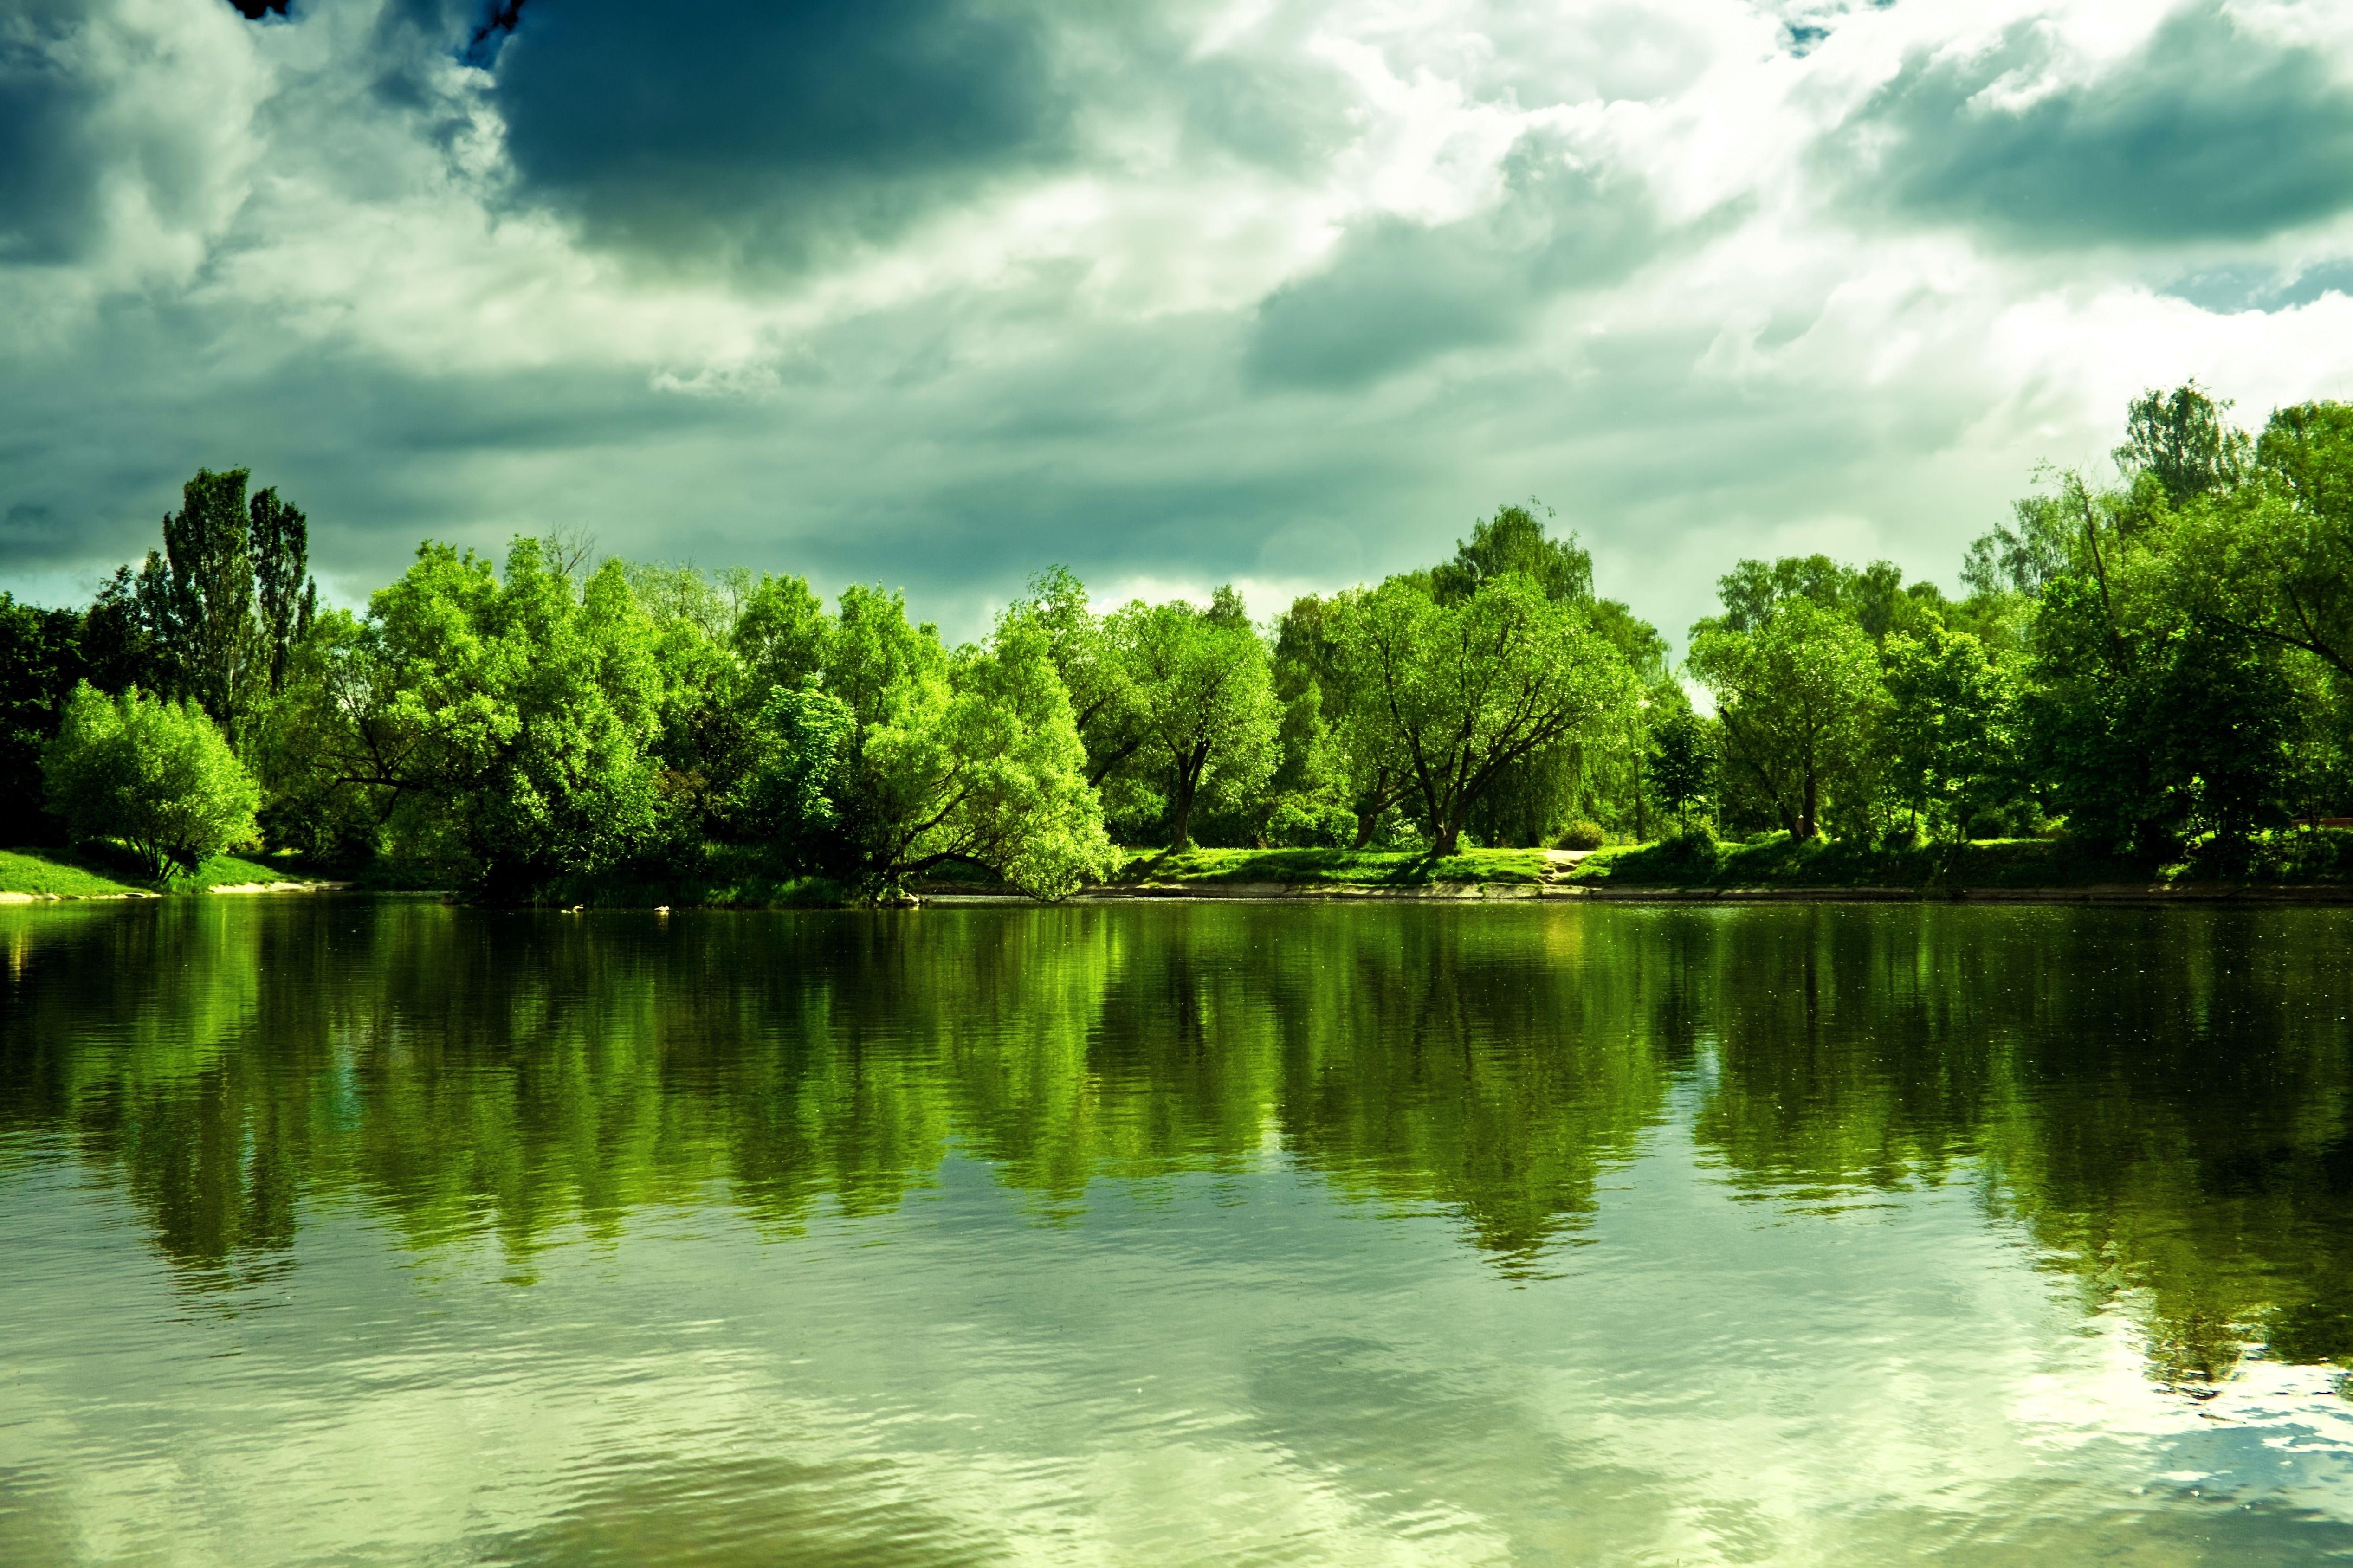 природа деревья небо река дома  № 571503 бесплатно